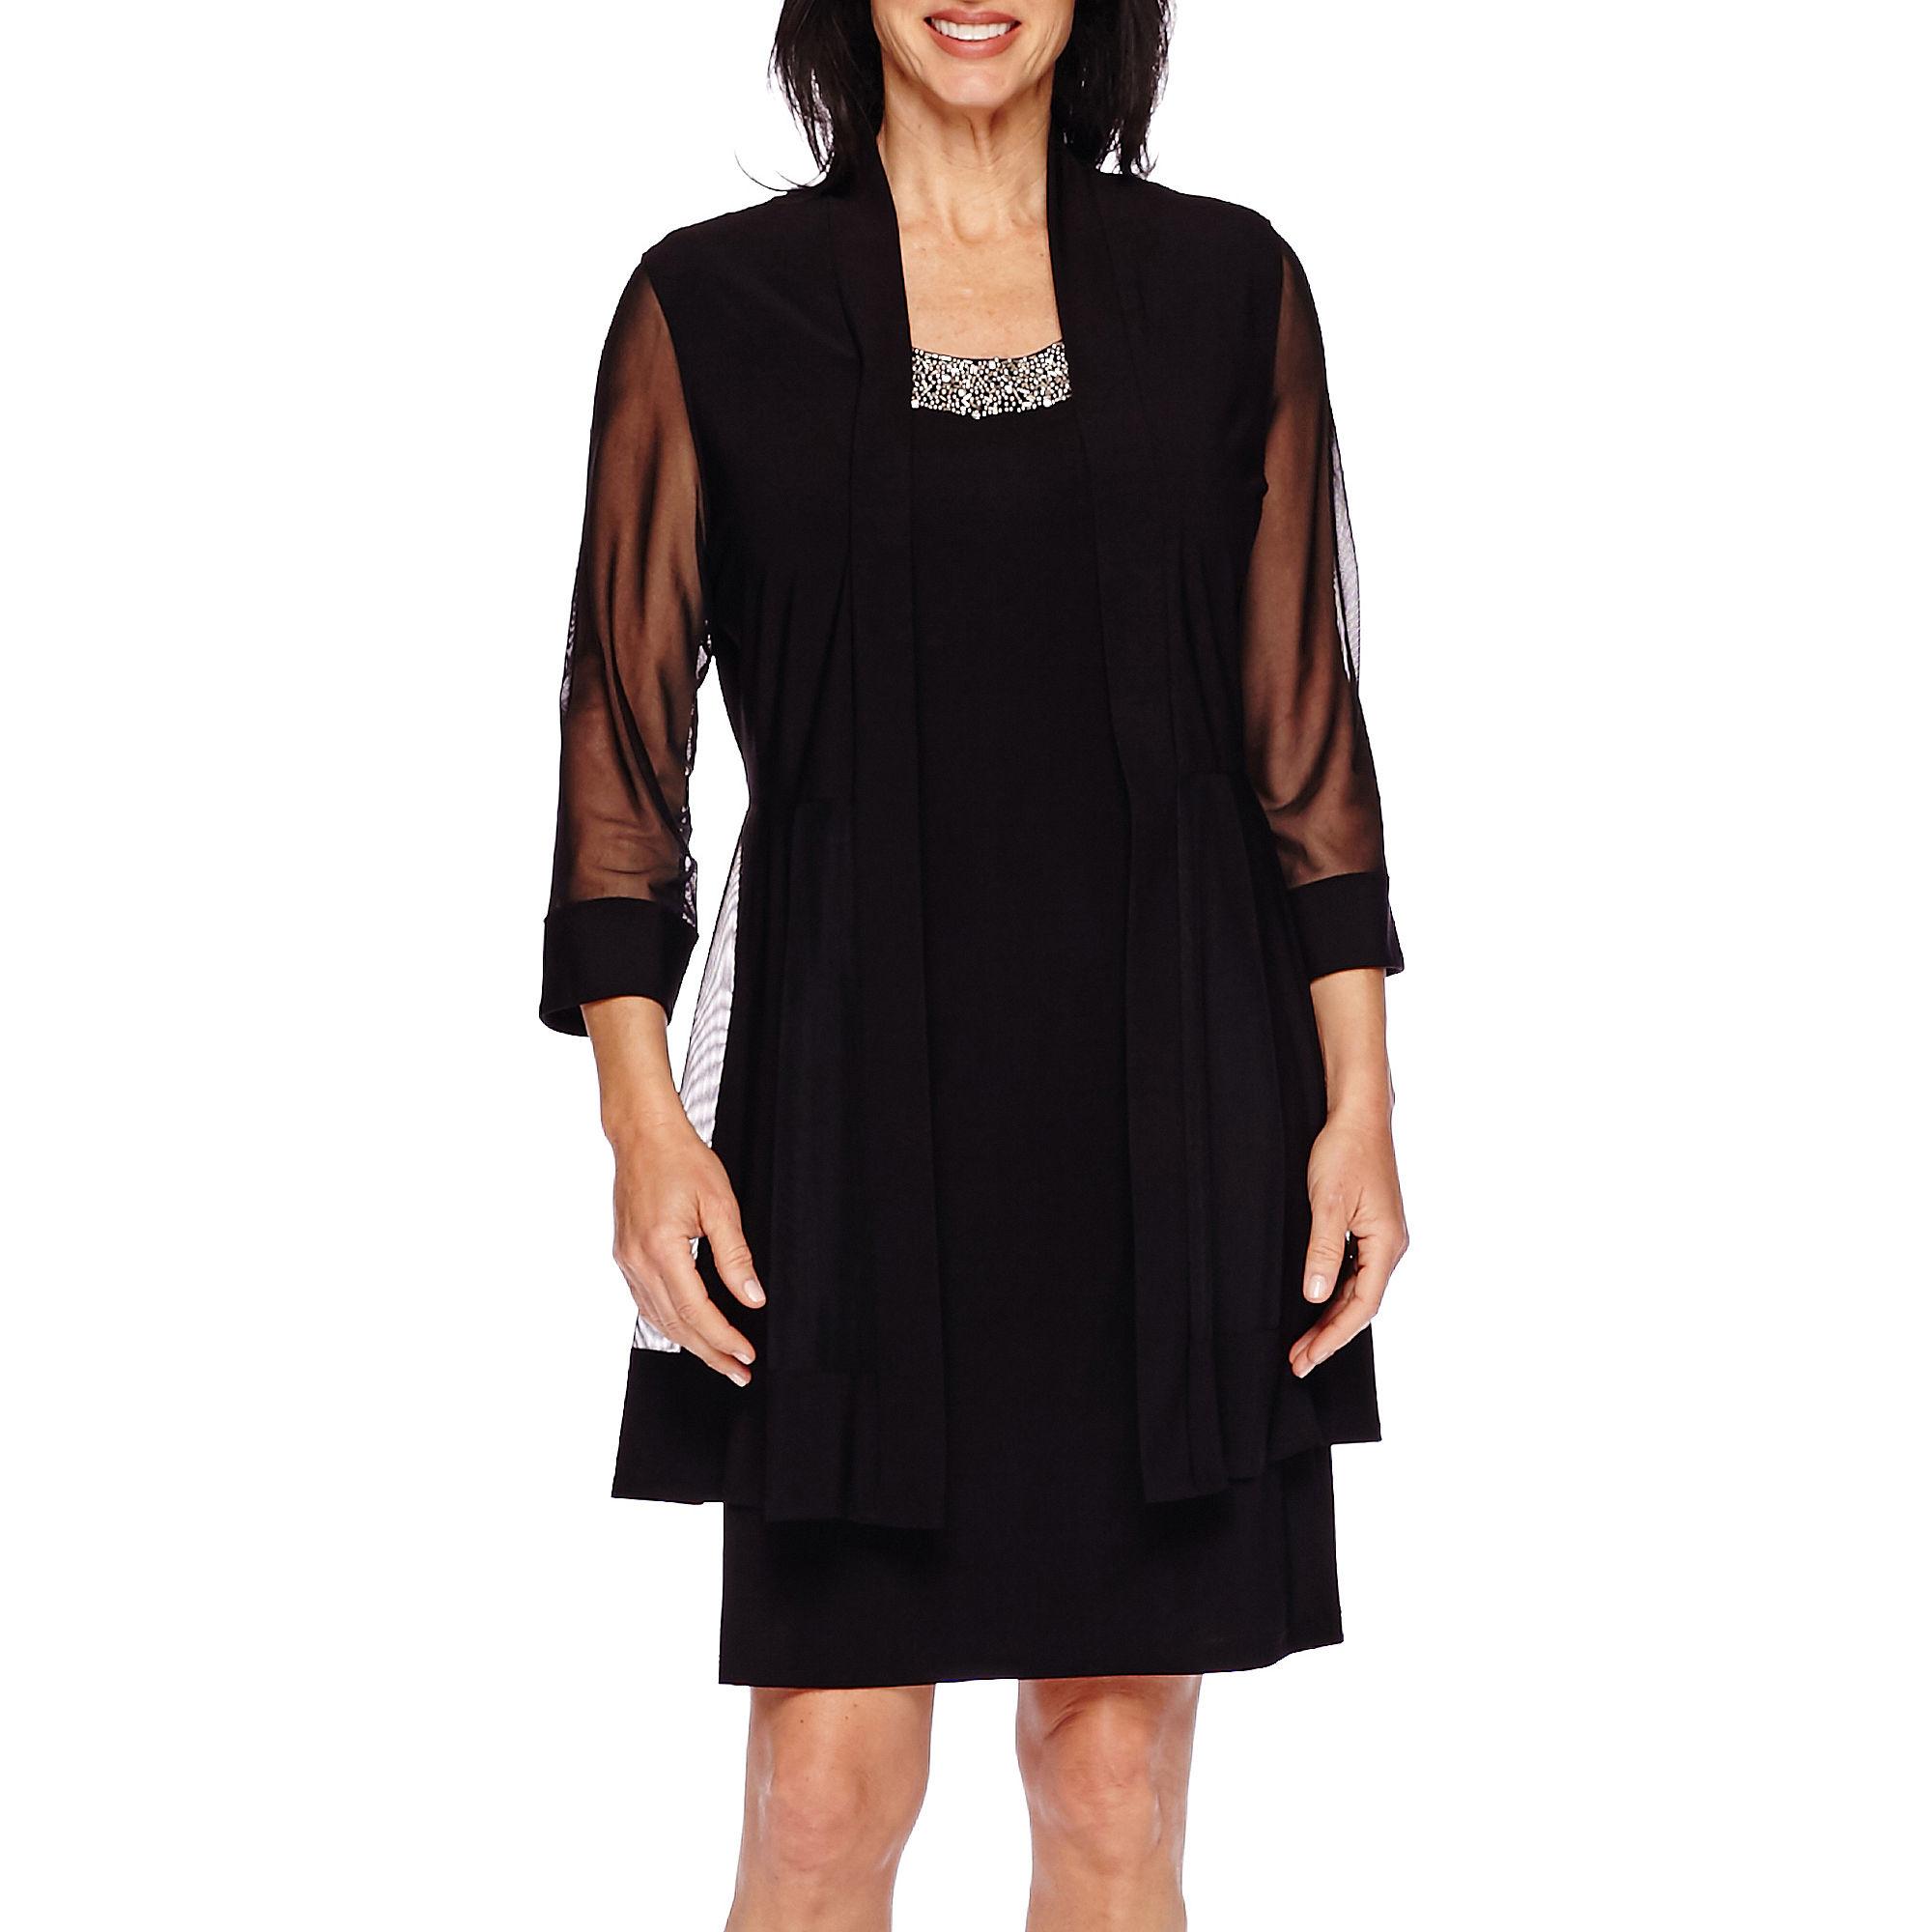 UPC 882191416057 - R & M Richards® Beaded Jacket Dress | upcitemdb.com